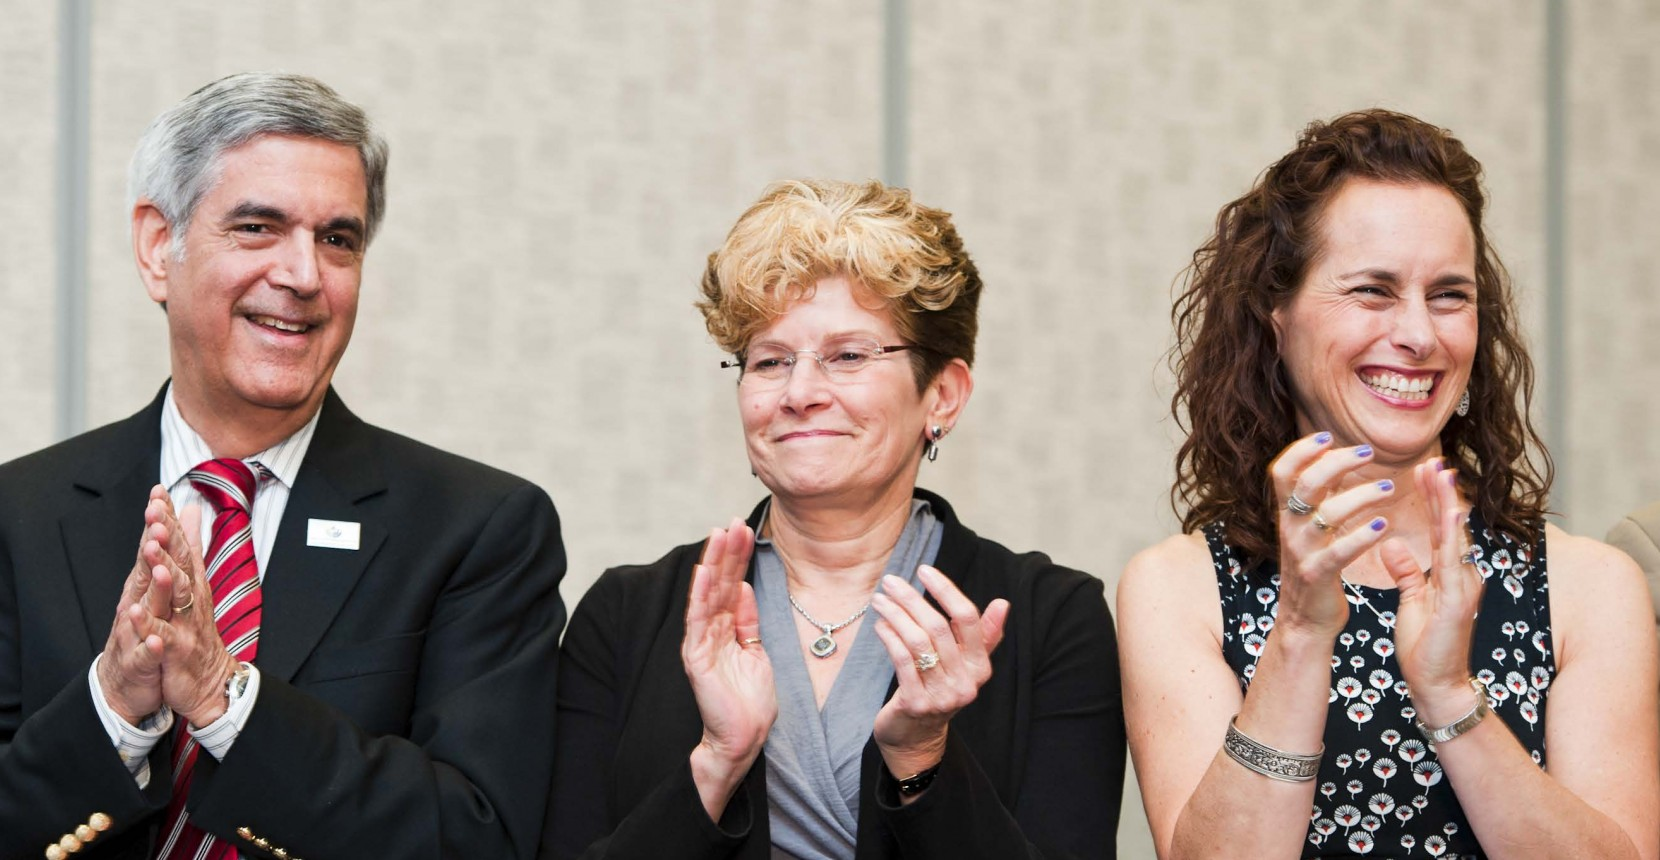 Cantors Richard Cohn, Kay Greenwald and Susan Caro, past presidents of the ACC